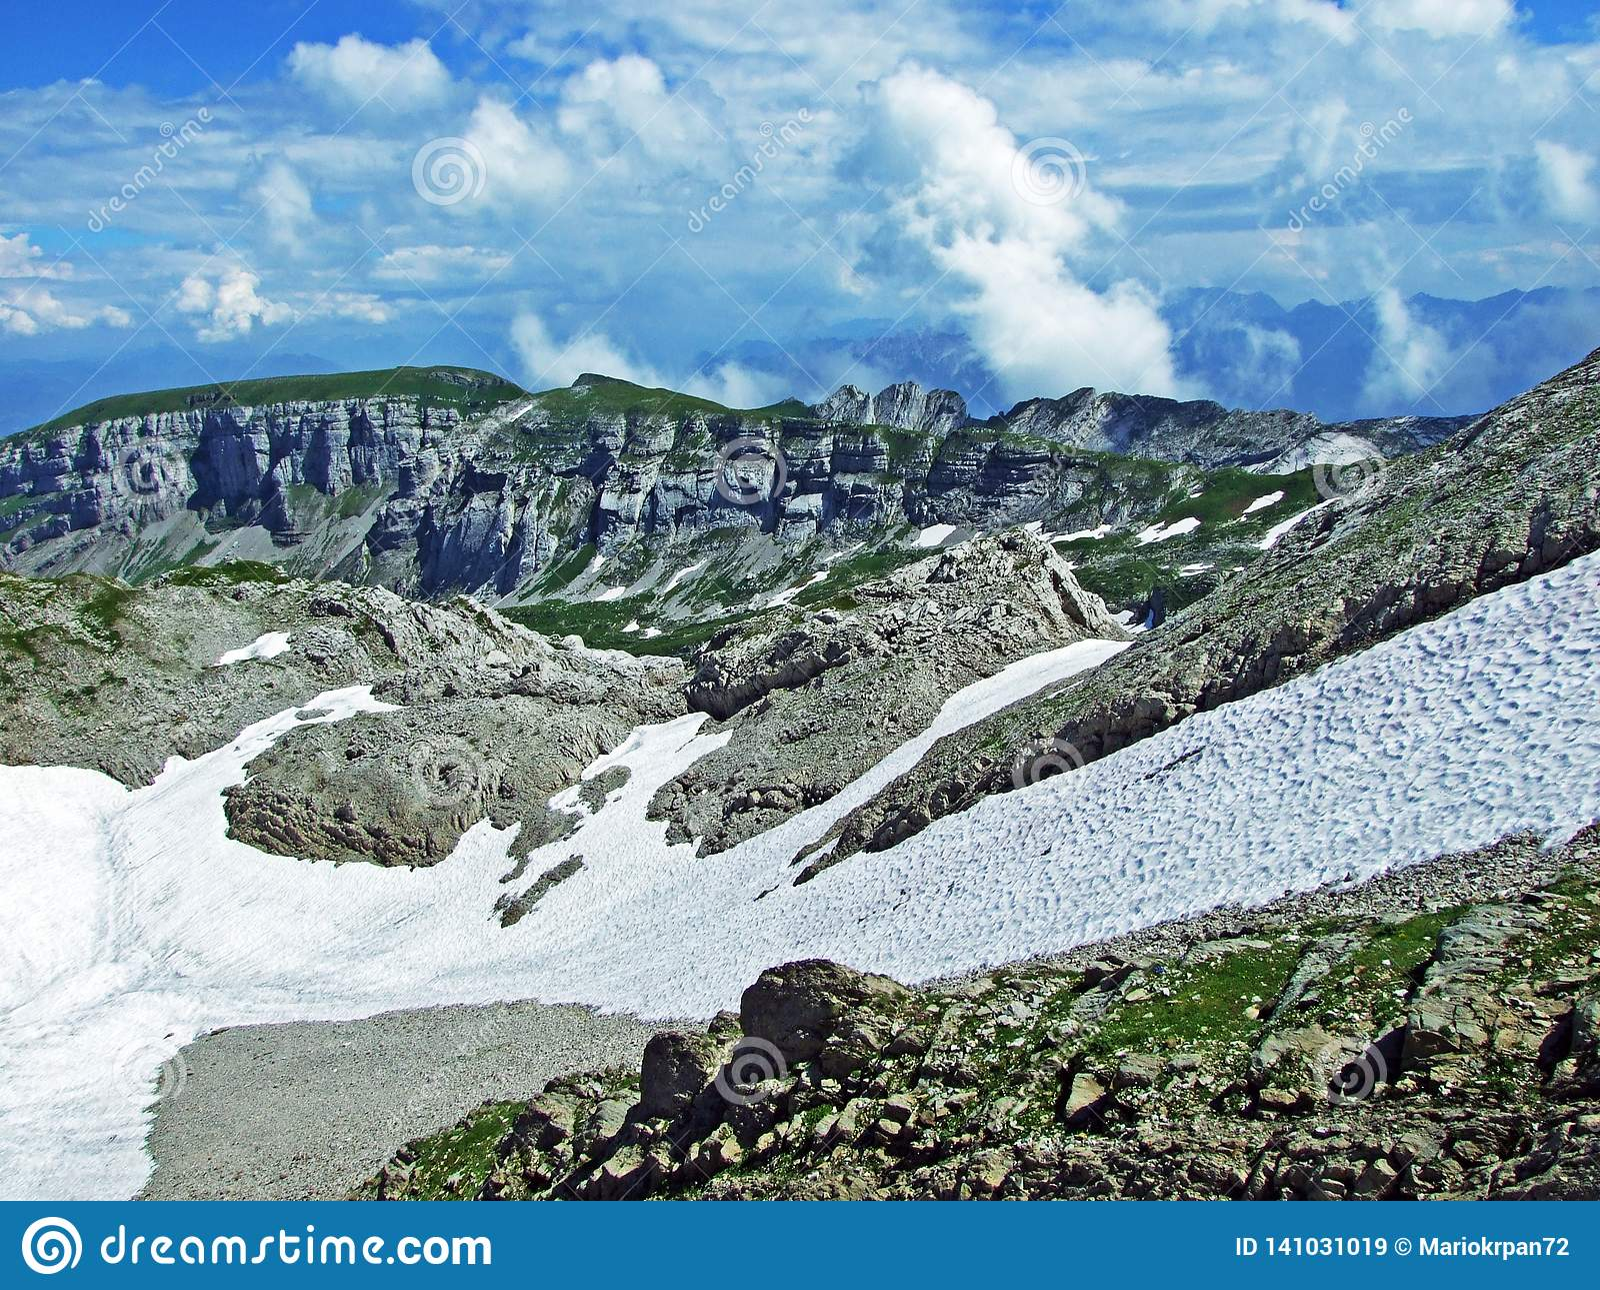 Rocky mountain ridge Roslenfirst and Saxer First in Alpstein mountain range